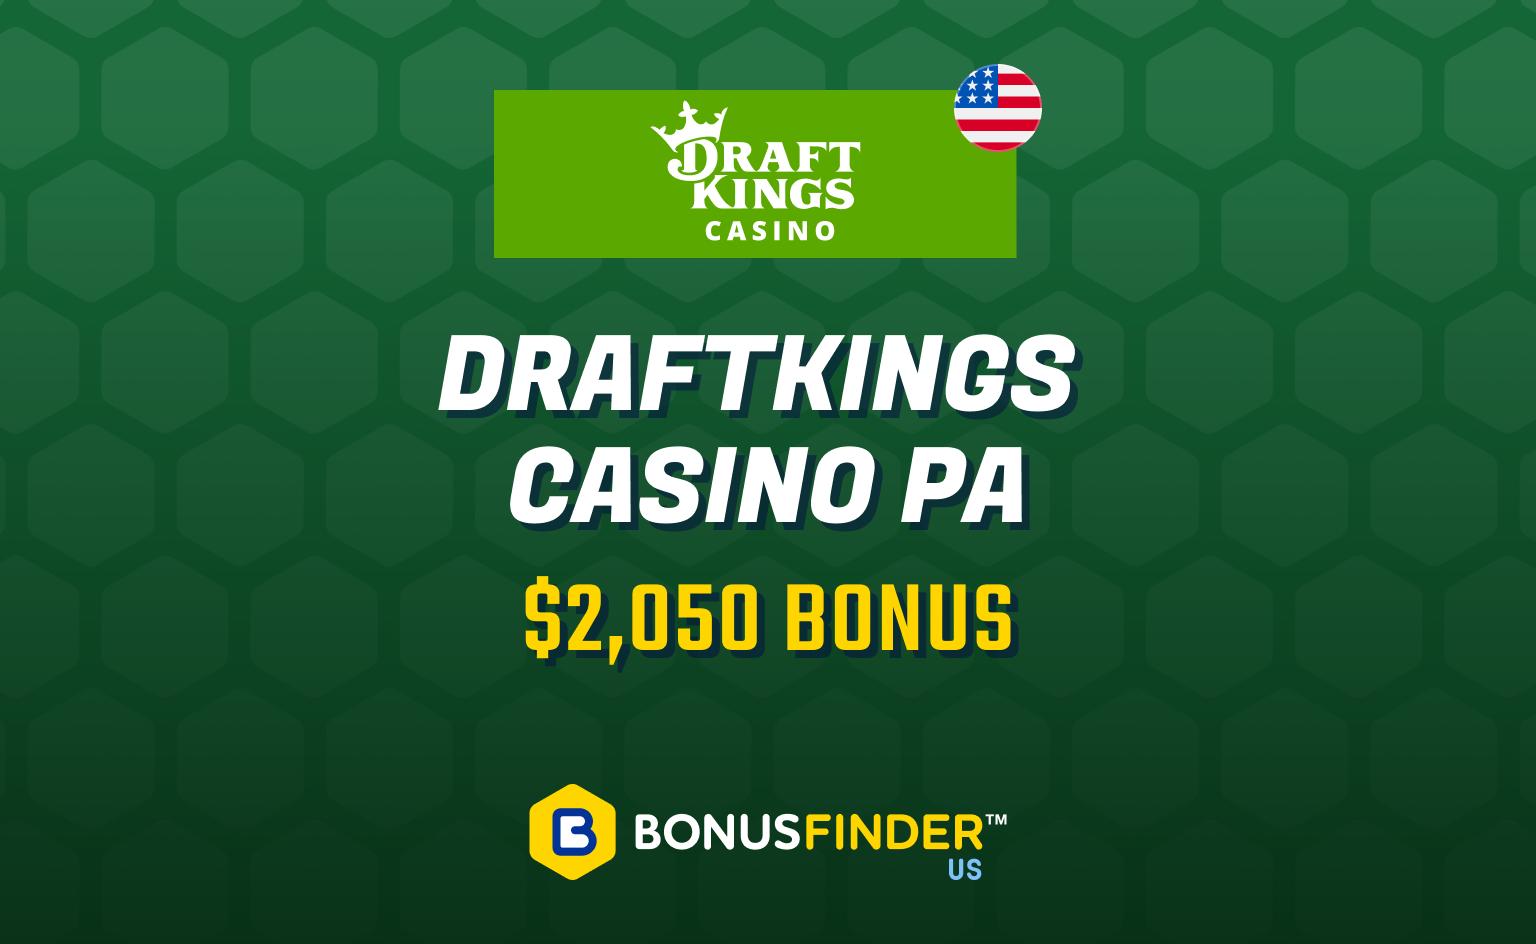 DraftKings PA bonus